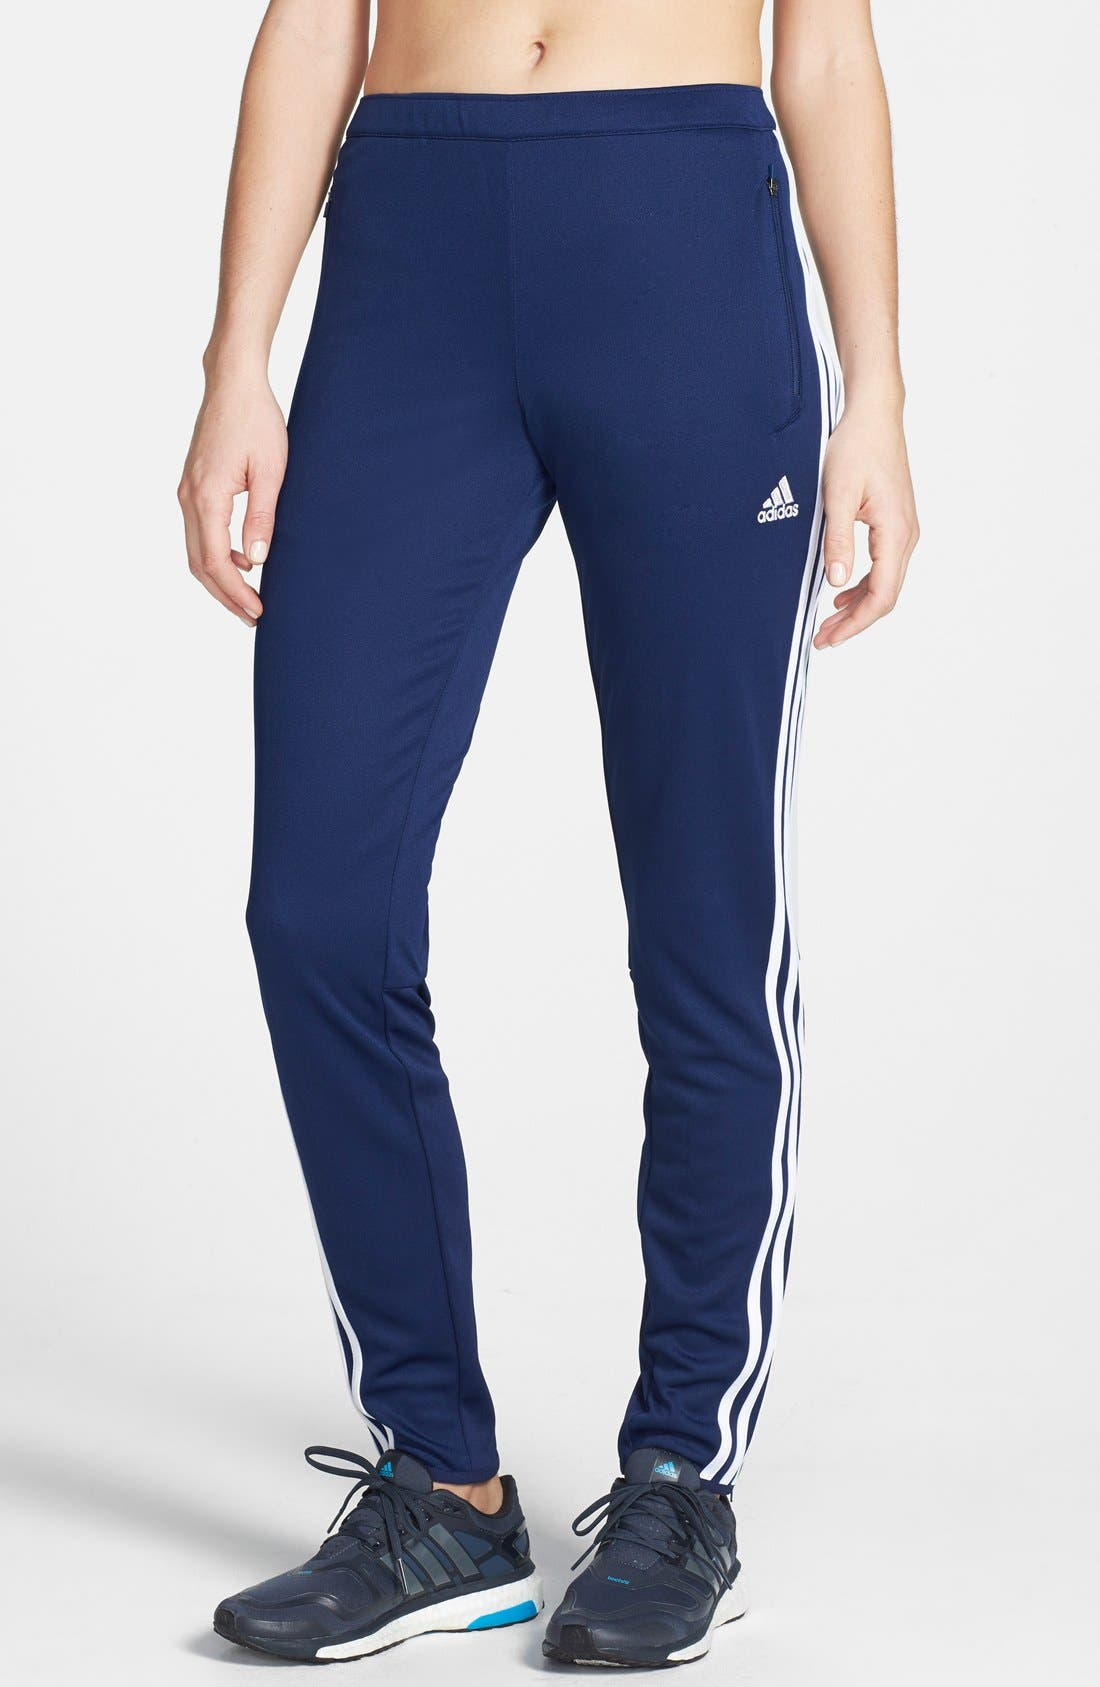 Main Image - adidas 'Tiro 13' Training Pants